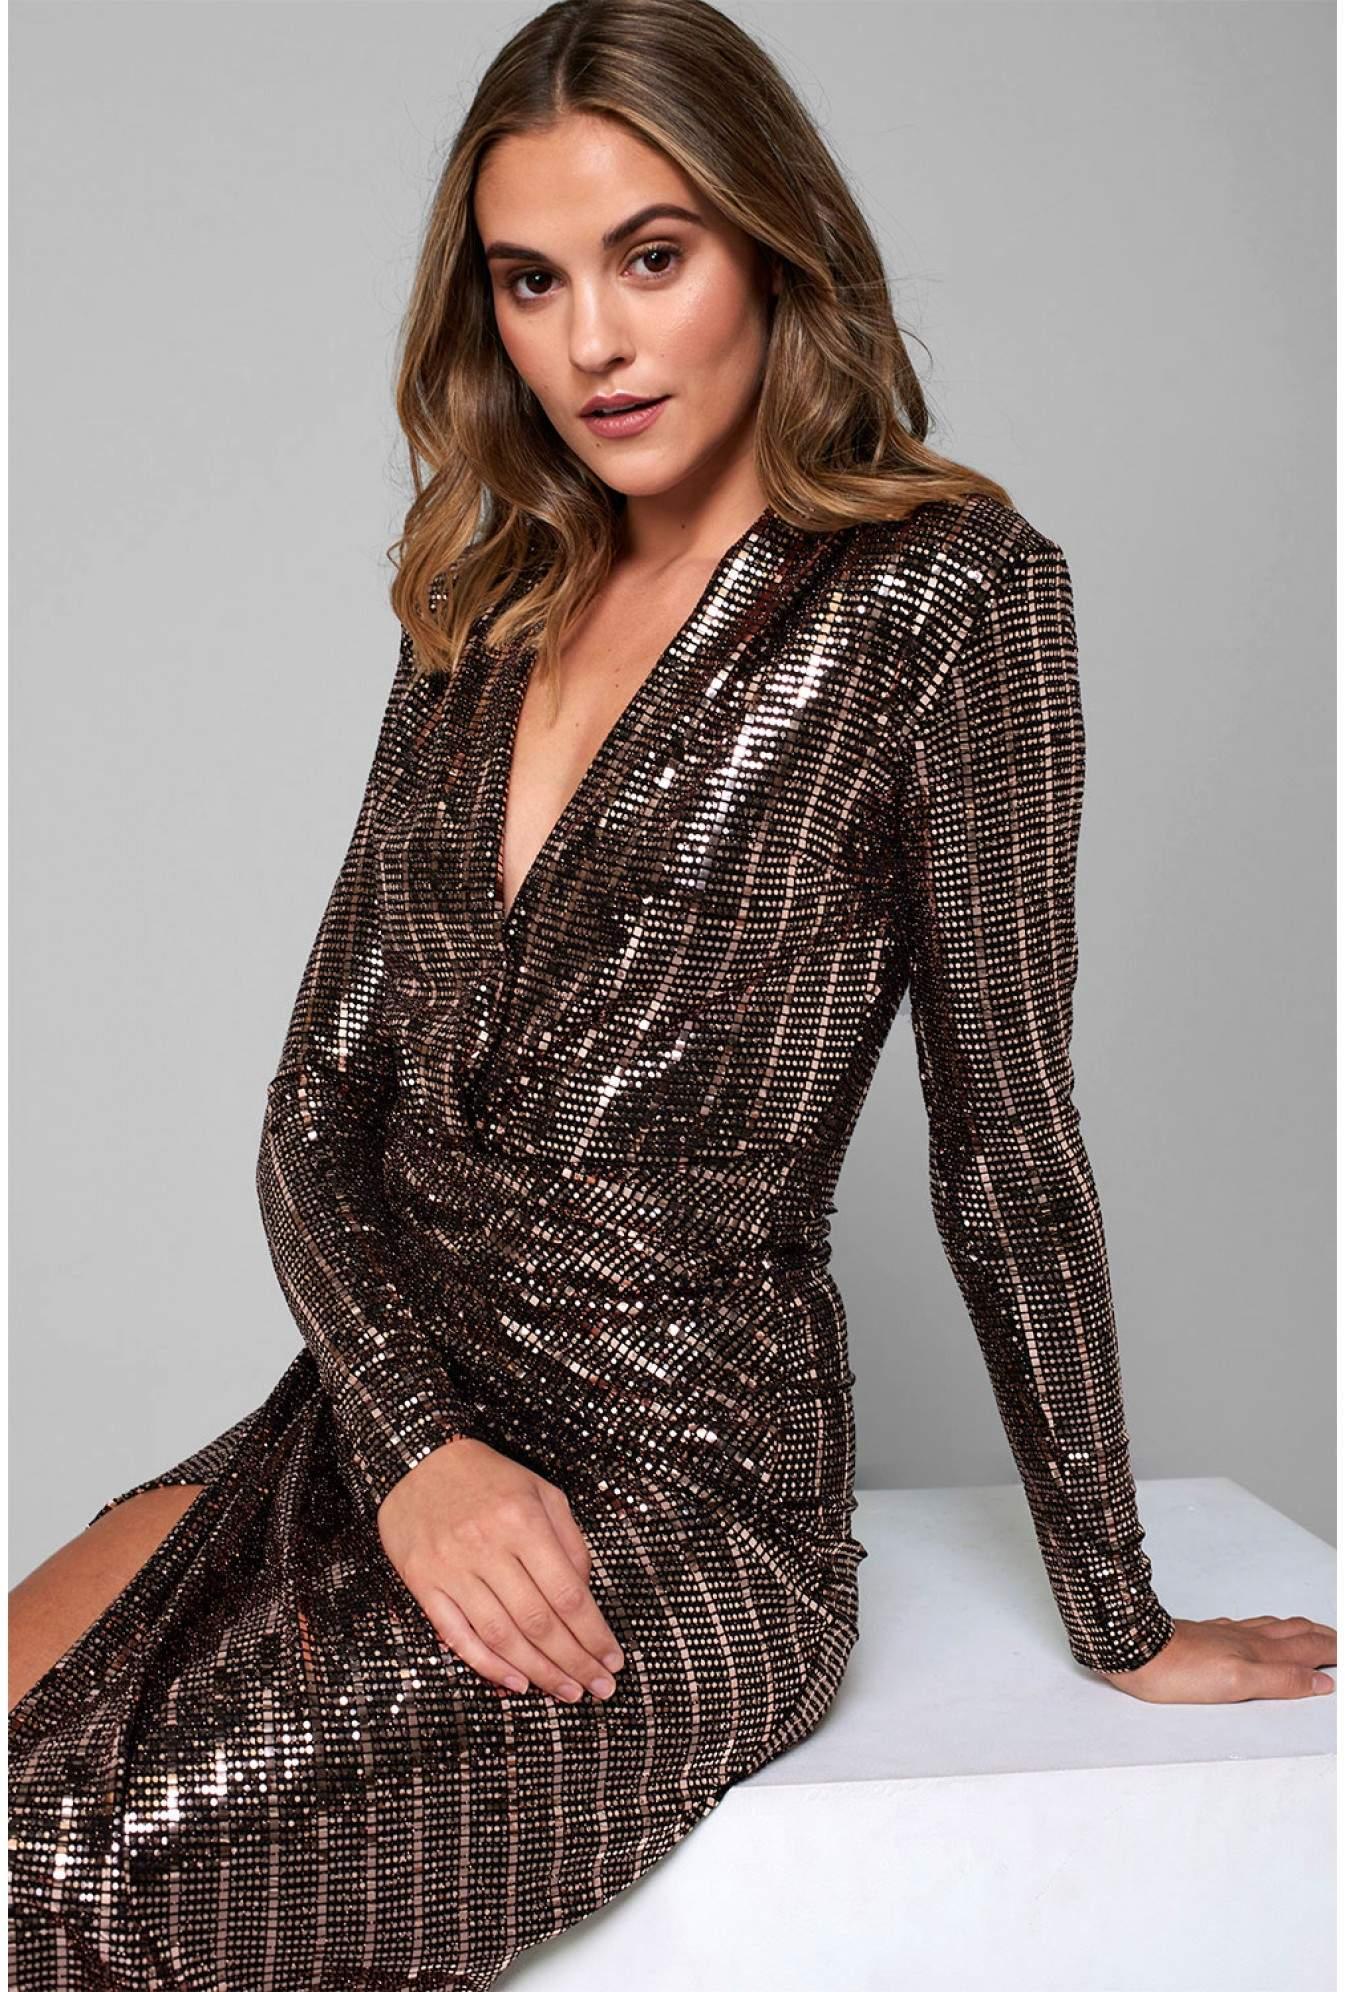 37dac4a211 John Zack Kim Deep V Midi Dress in Gold Sequin